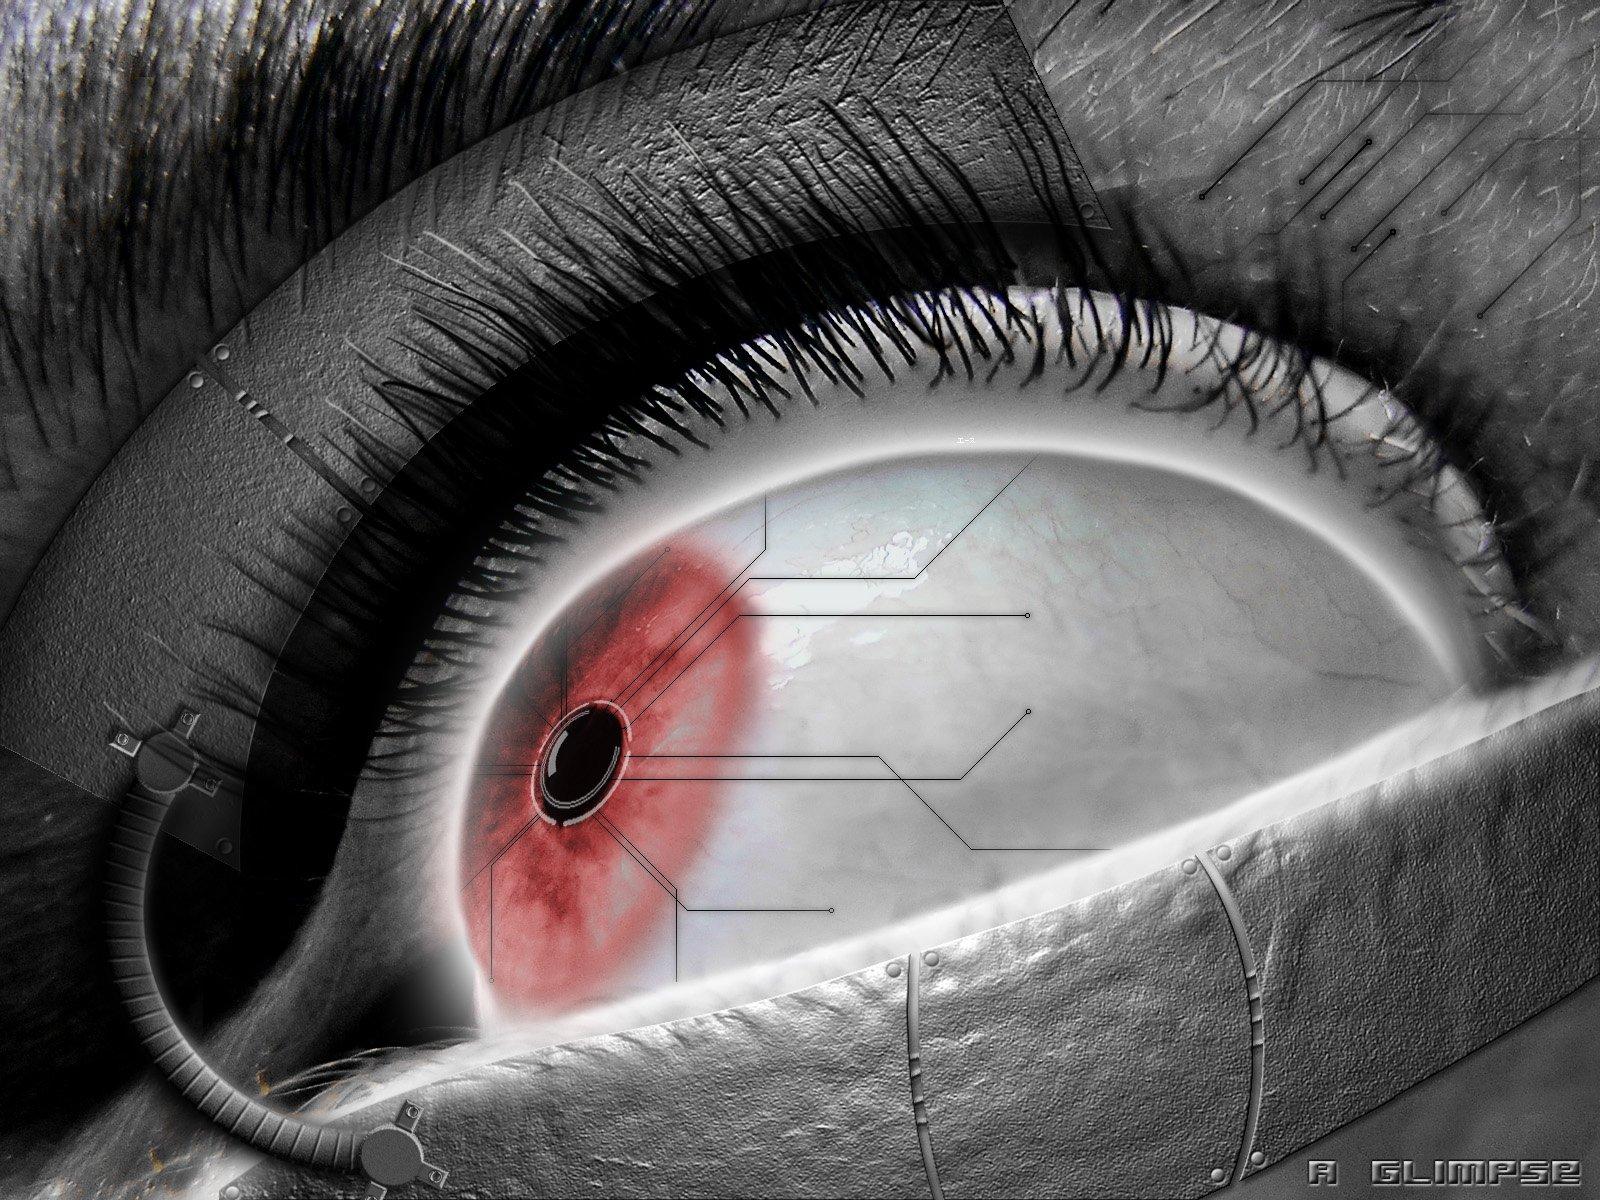 Artistic - Eye  Close-Up Wallpaper